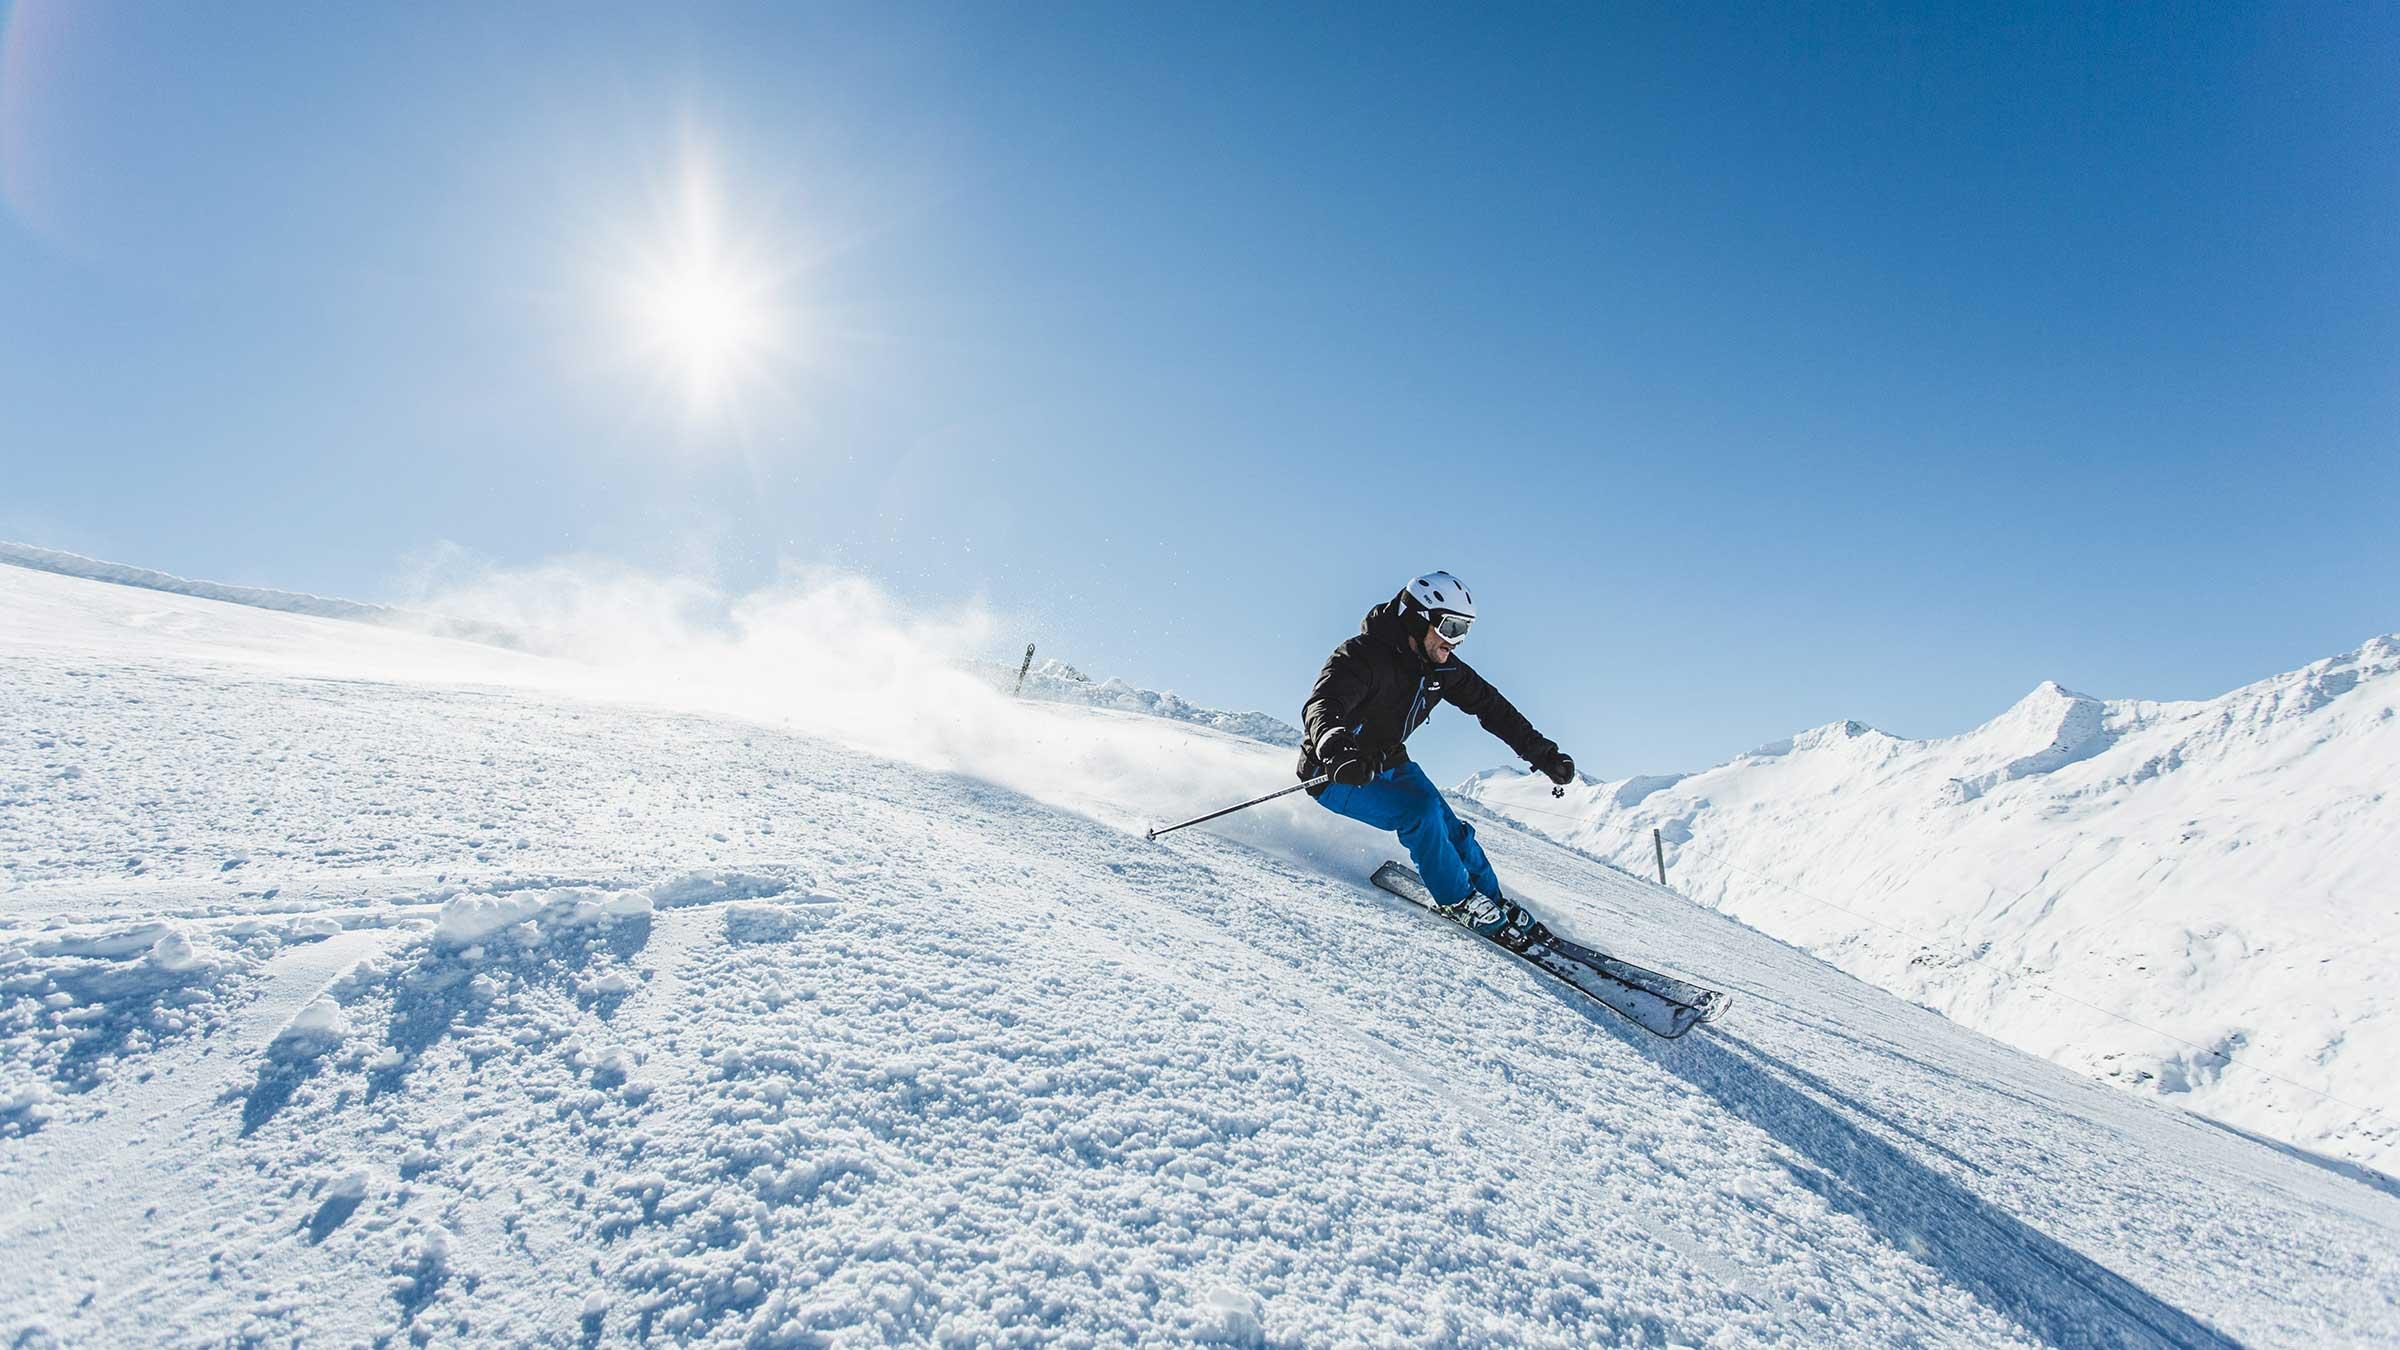 Skifahrer auf Piste - Obergurgl-Hochgurgl, Ötztal, Tirol